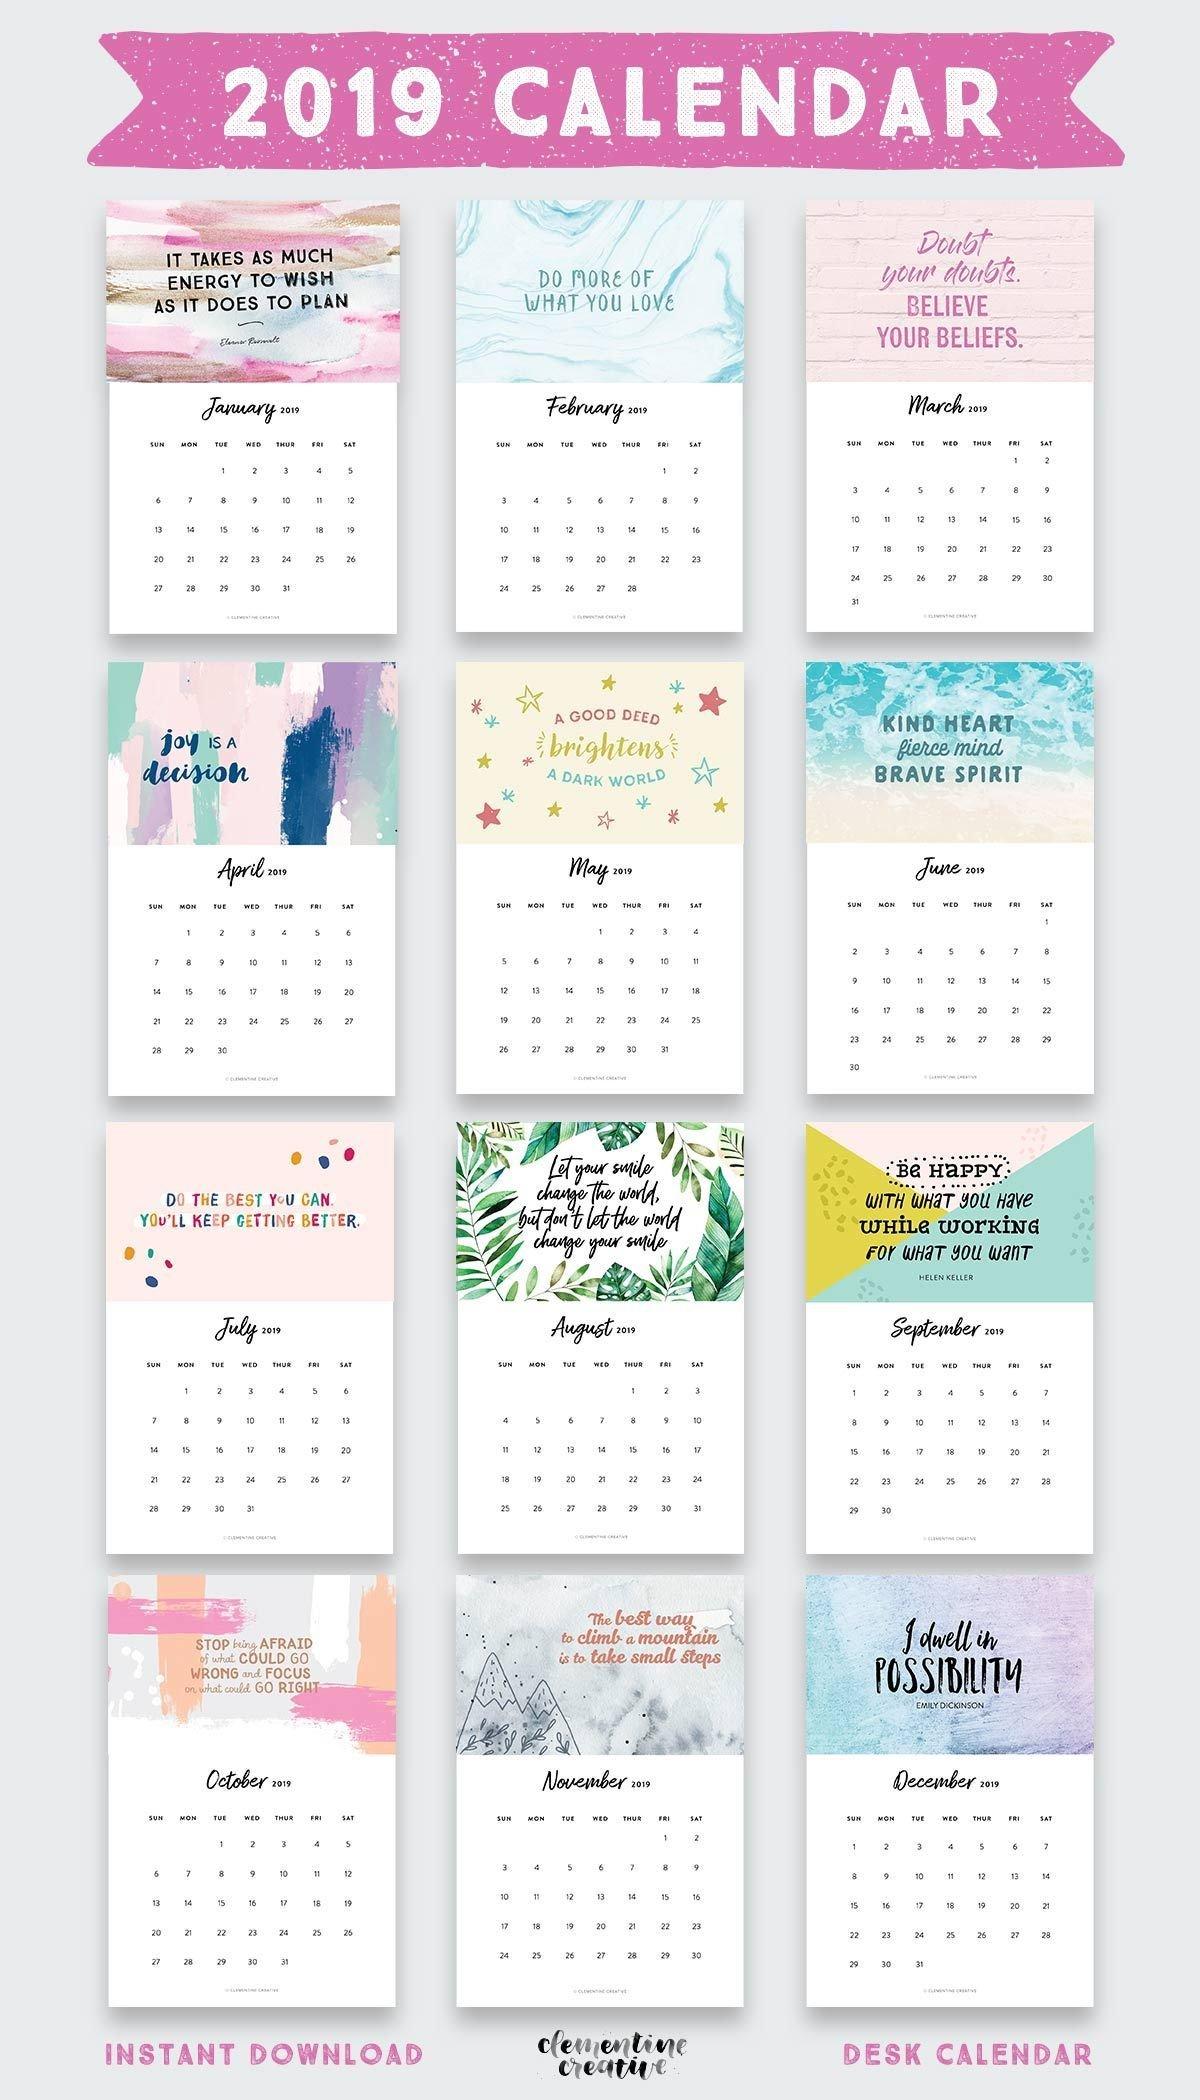 Printable 2019 Inspirational Quotes Calendar | Graphic Design | Desk Calendar 2019 Quotes